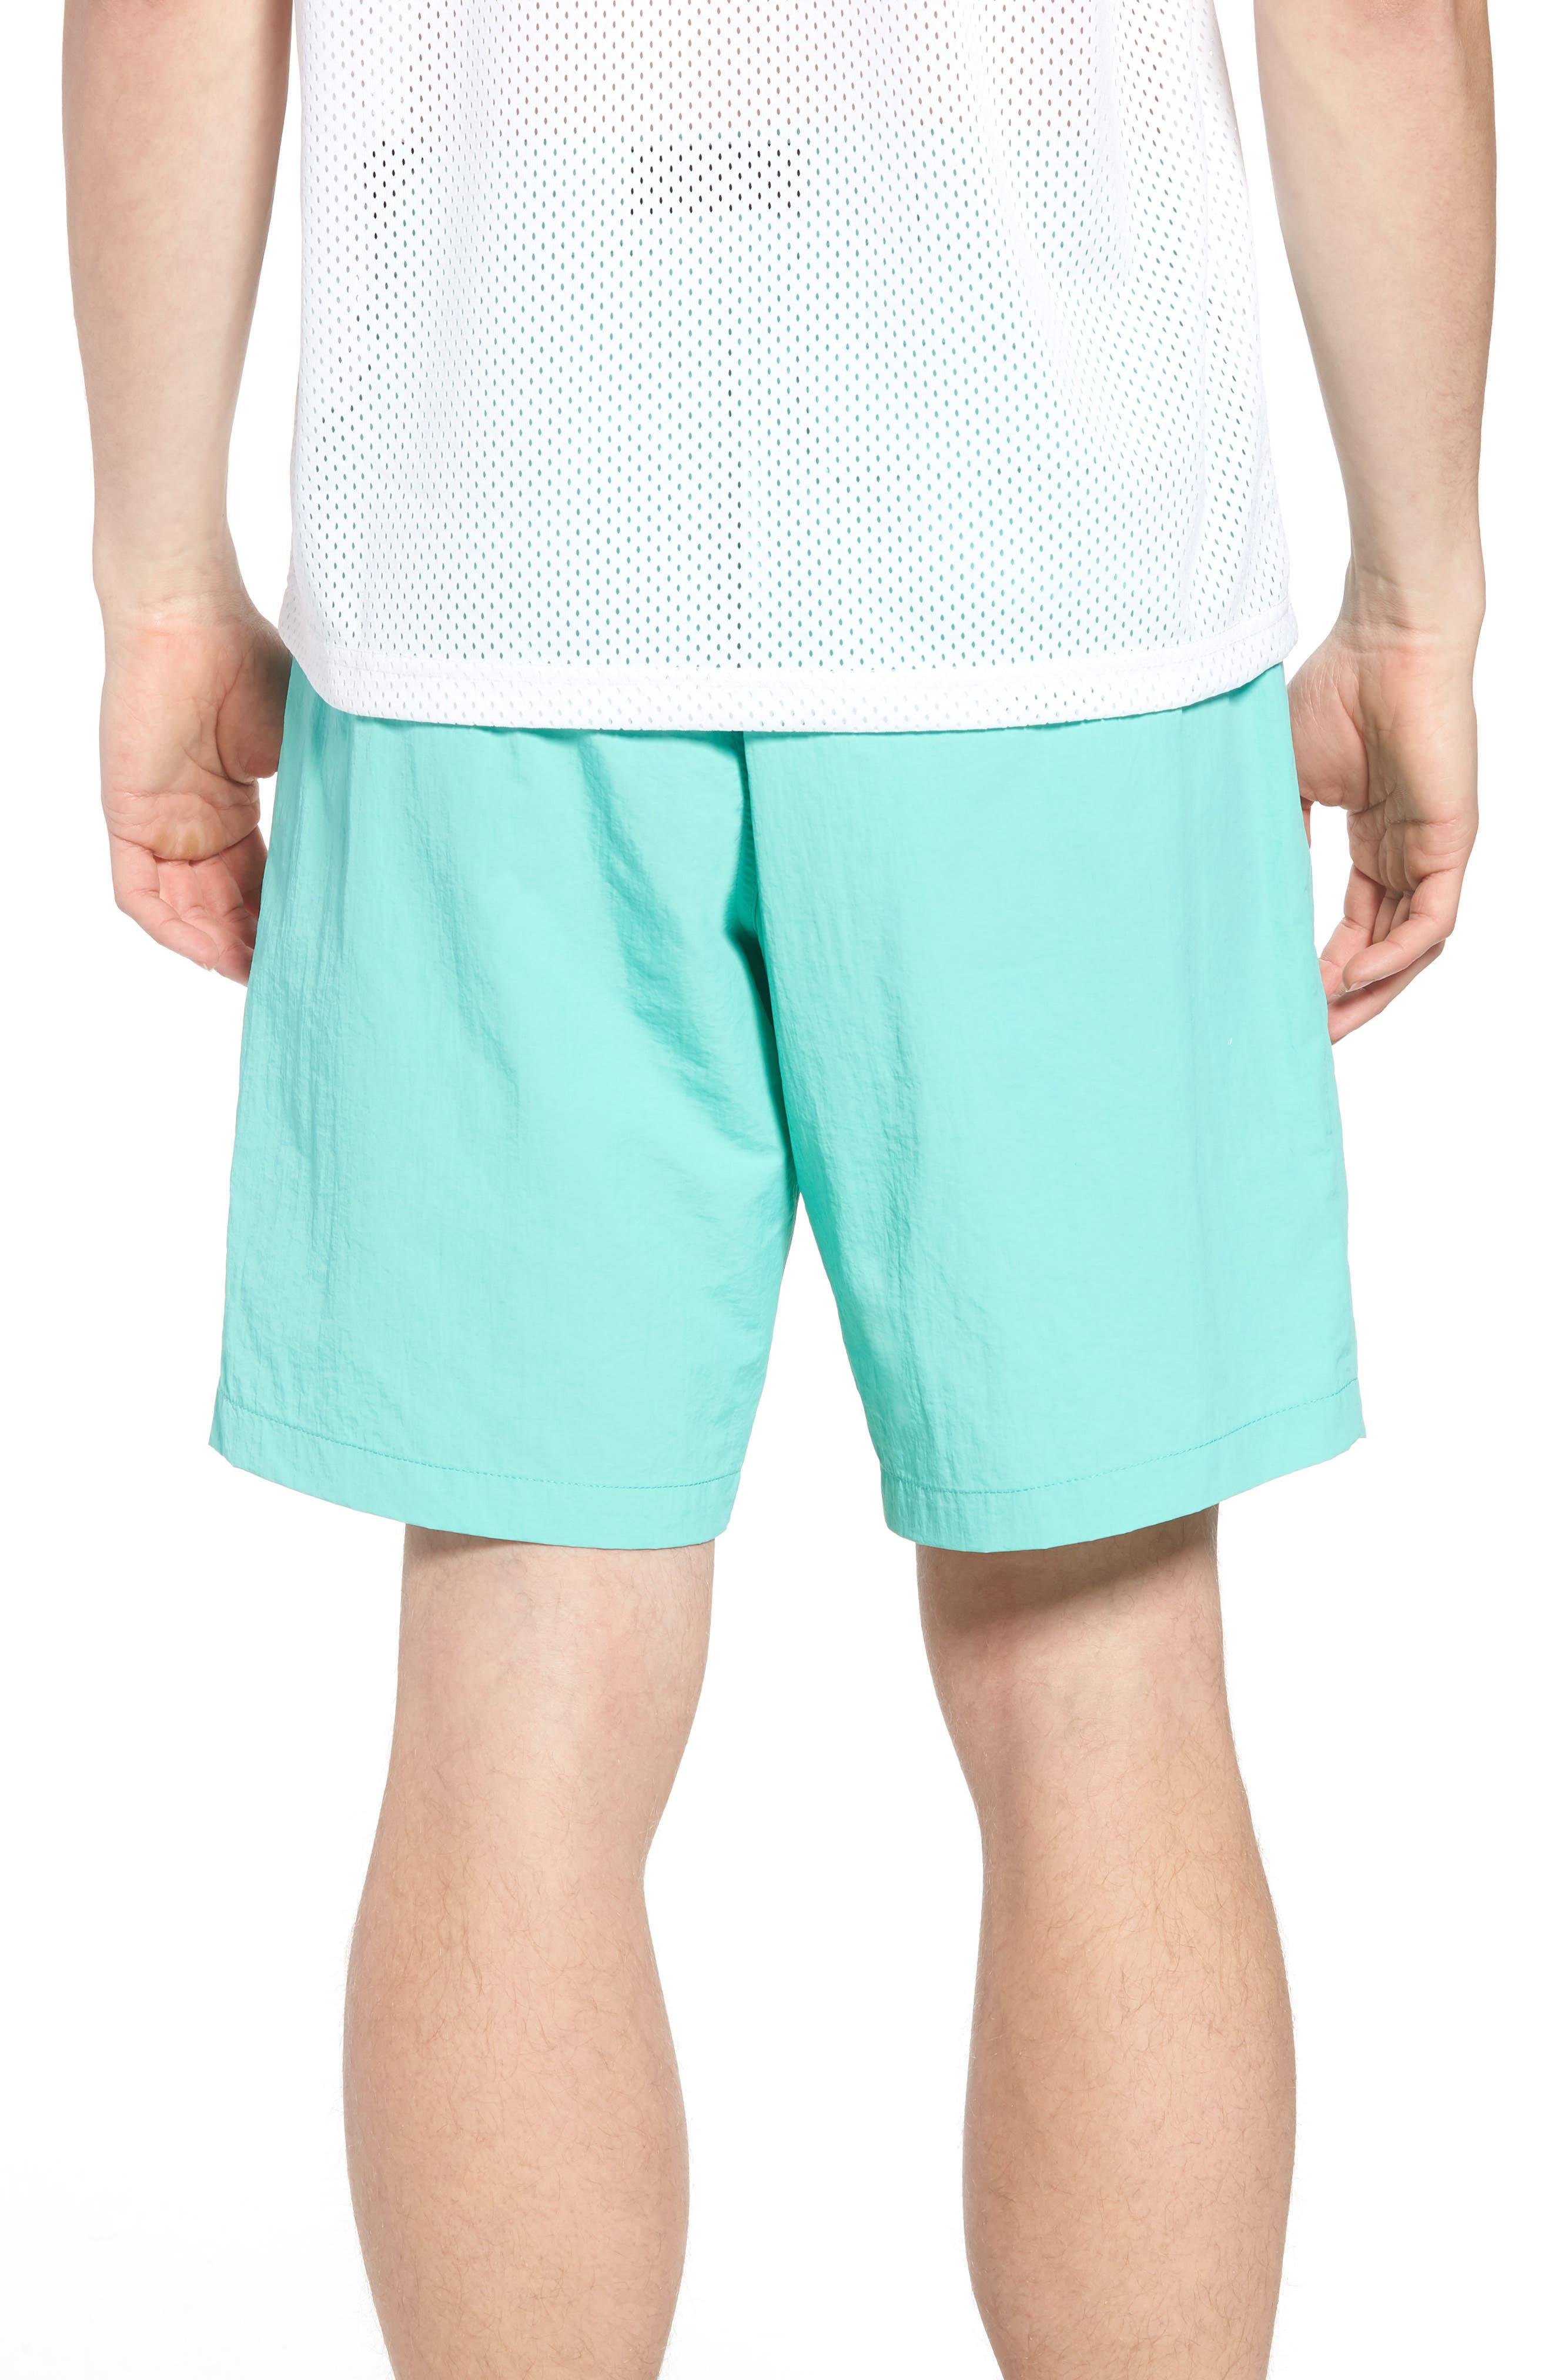 Mondy Shorts,                             Alternate thumbnail 7, color,